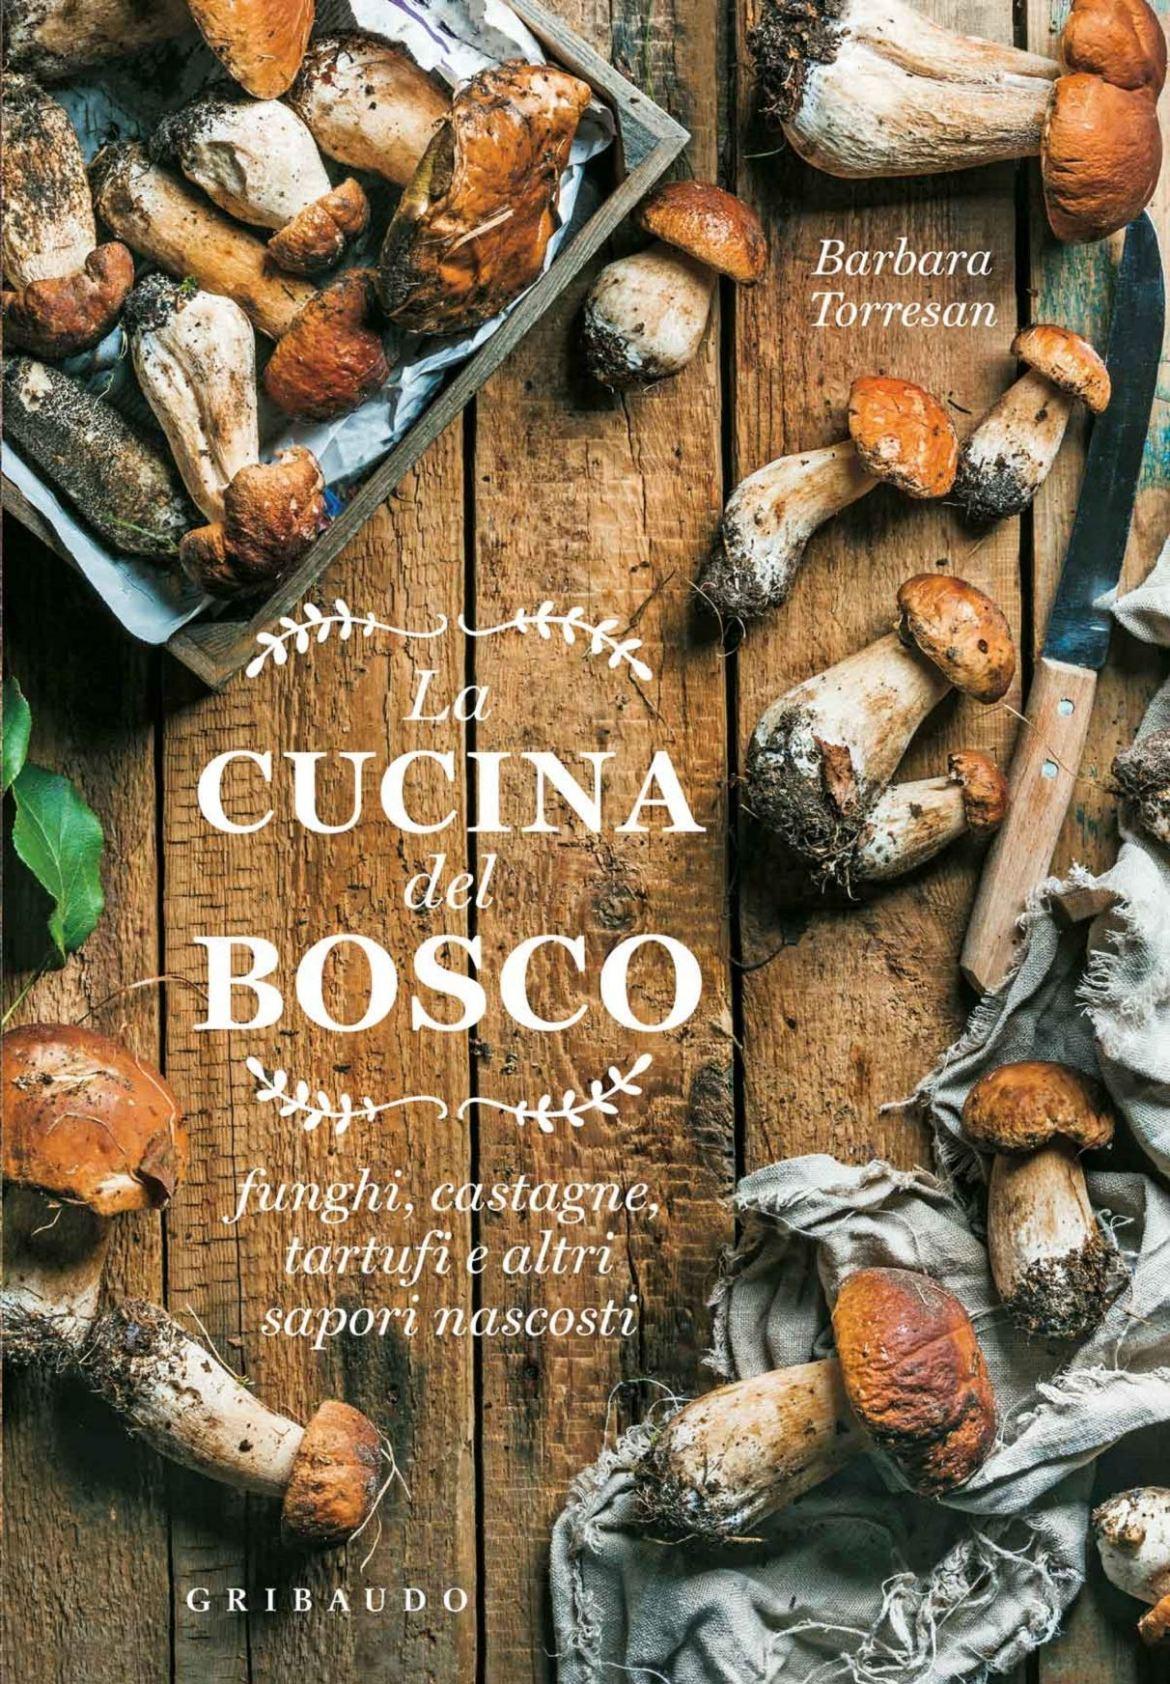 Recensione di La Cucina Del Bosco – Barbara Torresan